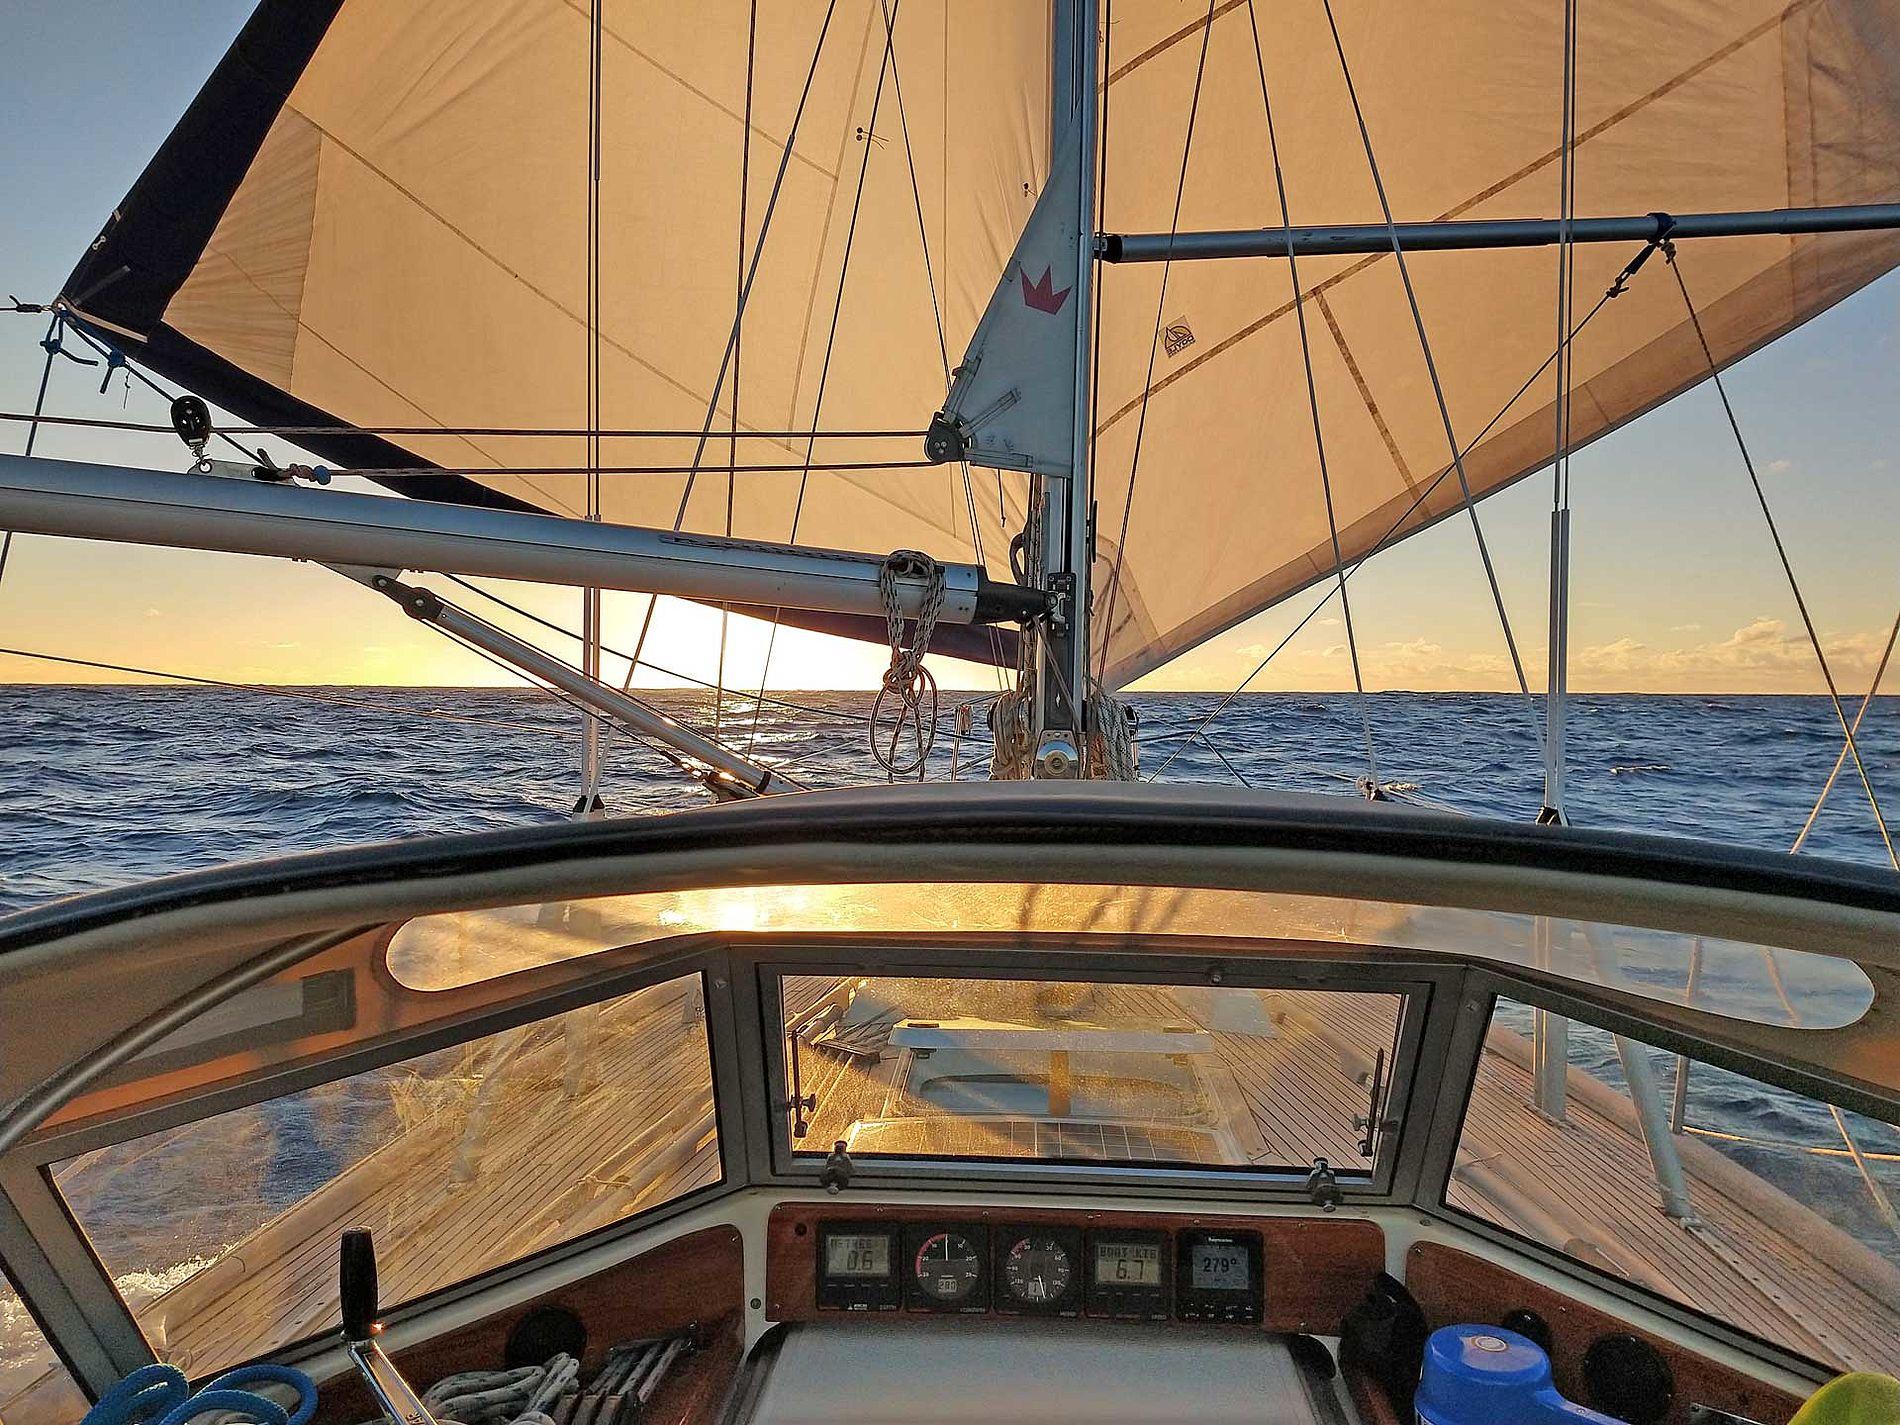 New book on long distance sailing in Irish Hallberg-Rassy 352